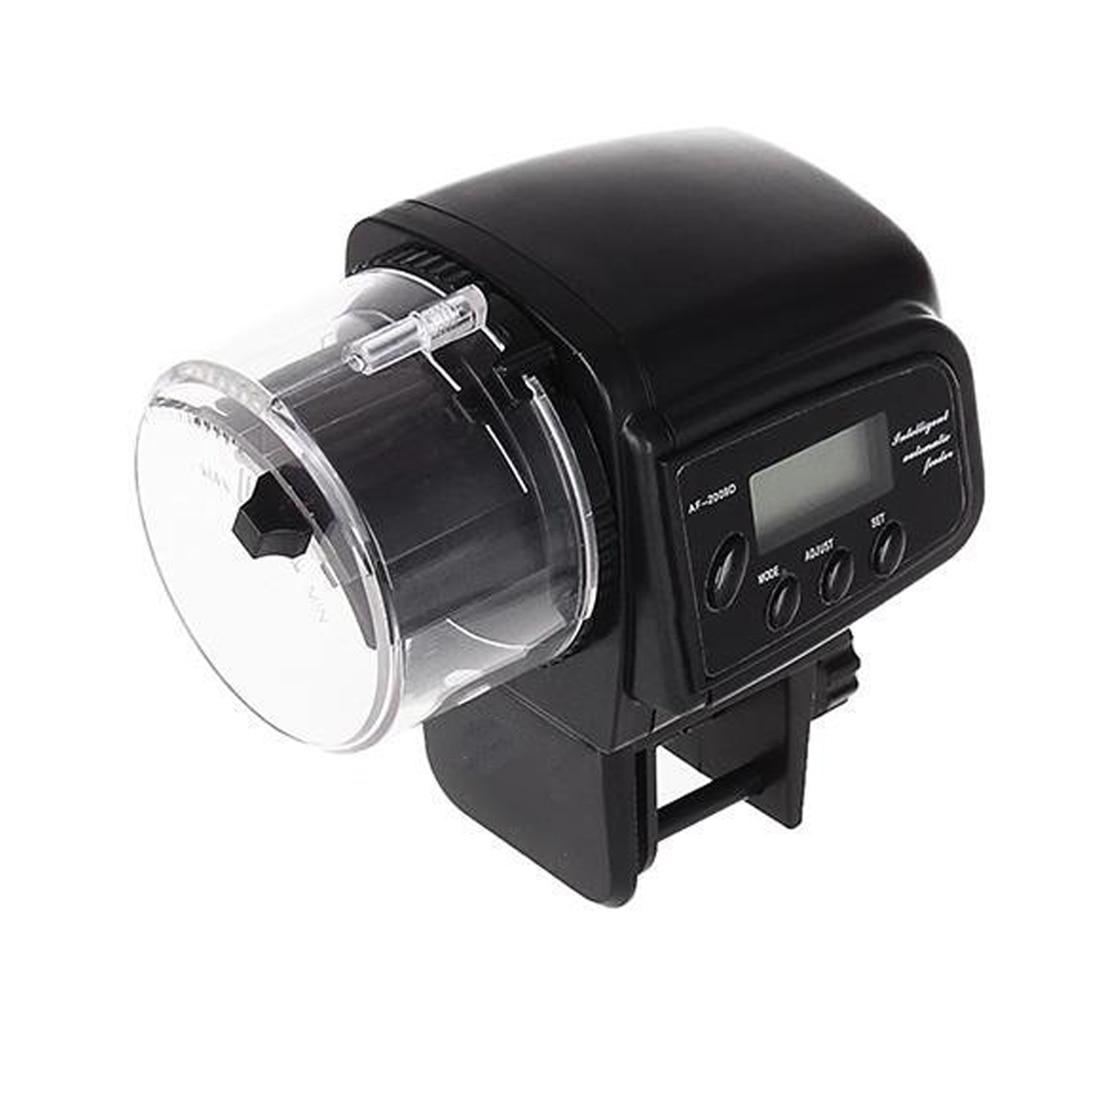 Fish tank feeder - New Aquarium Fish Tank Food Feeder Timer Lcd Display Automatic Manual Feeding Convenient China